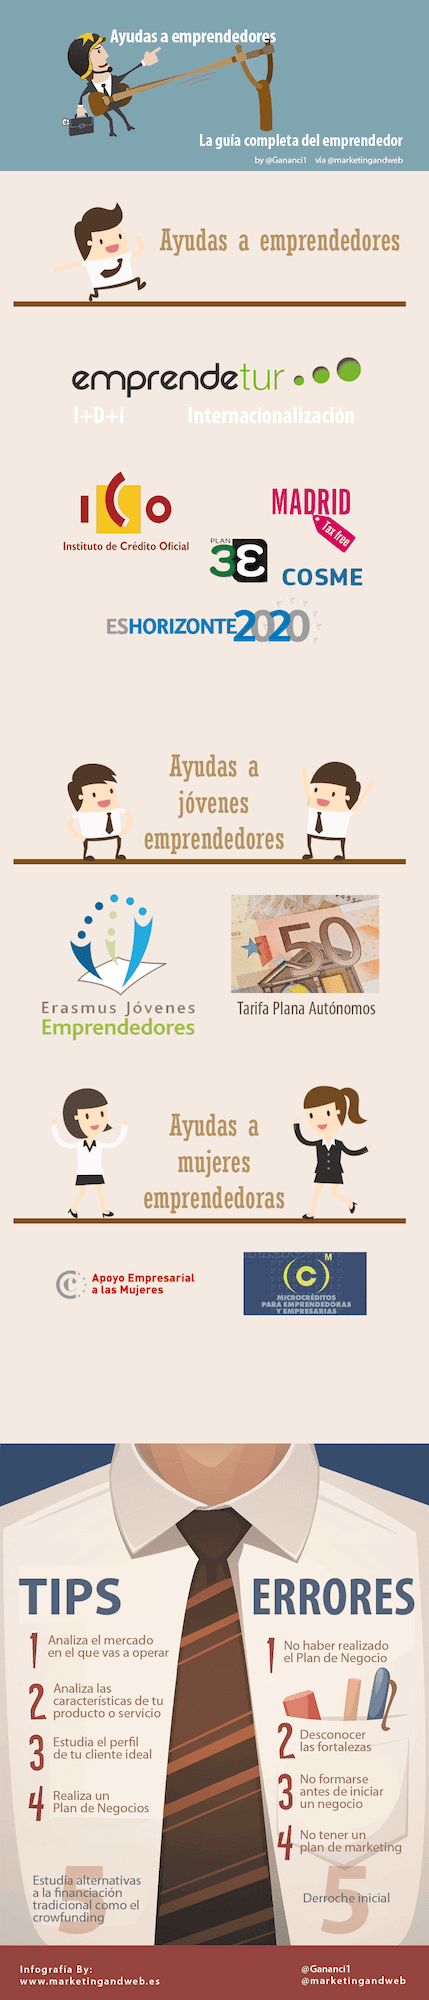 ayudas a emprendedores guía del emprendedor infografía